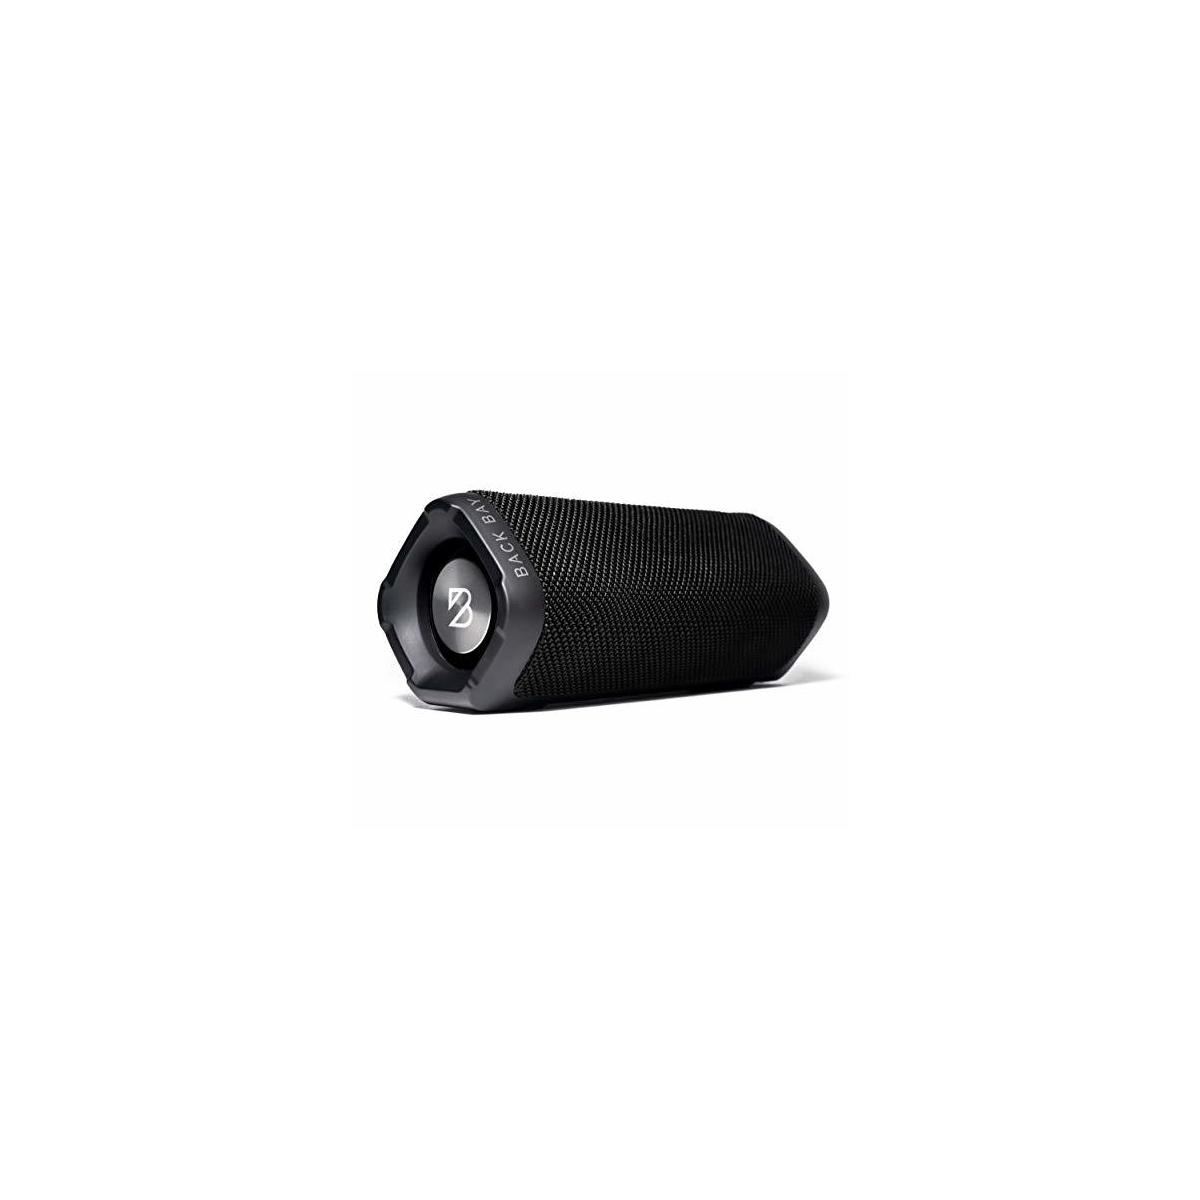 Newbury Wireless Speaker by Back Bay Audio - 24 Hour Battery Life and Amazing Bass